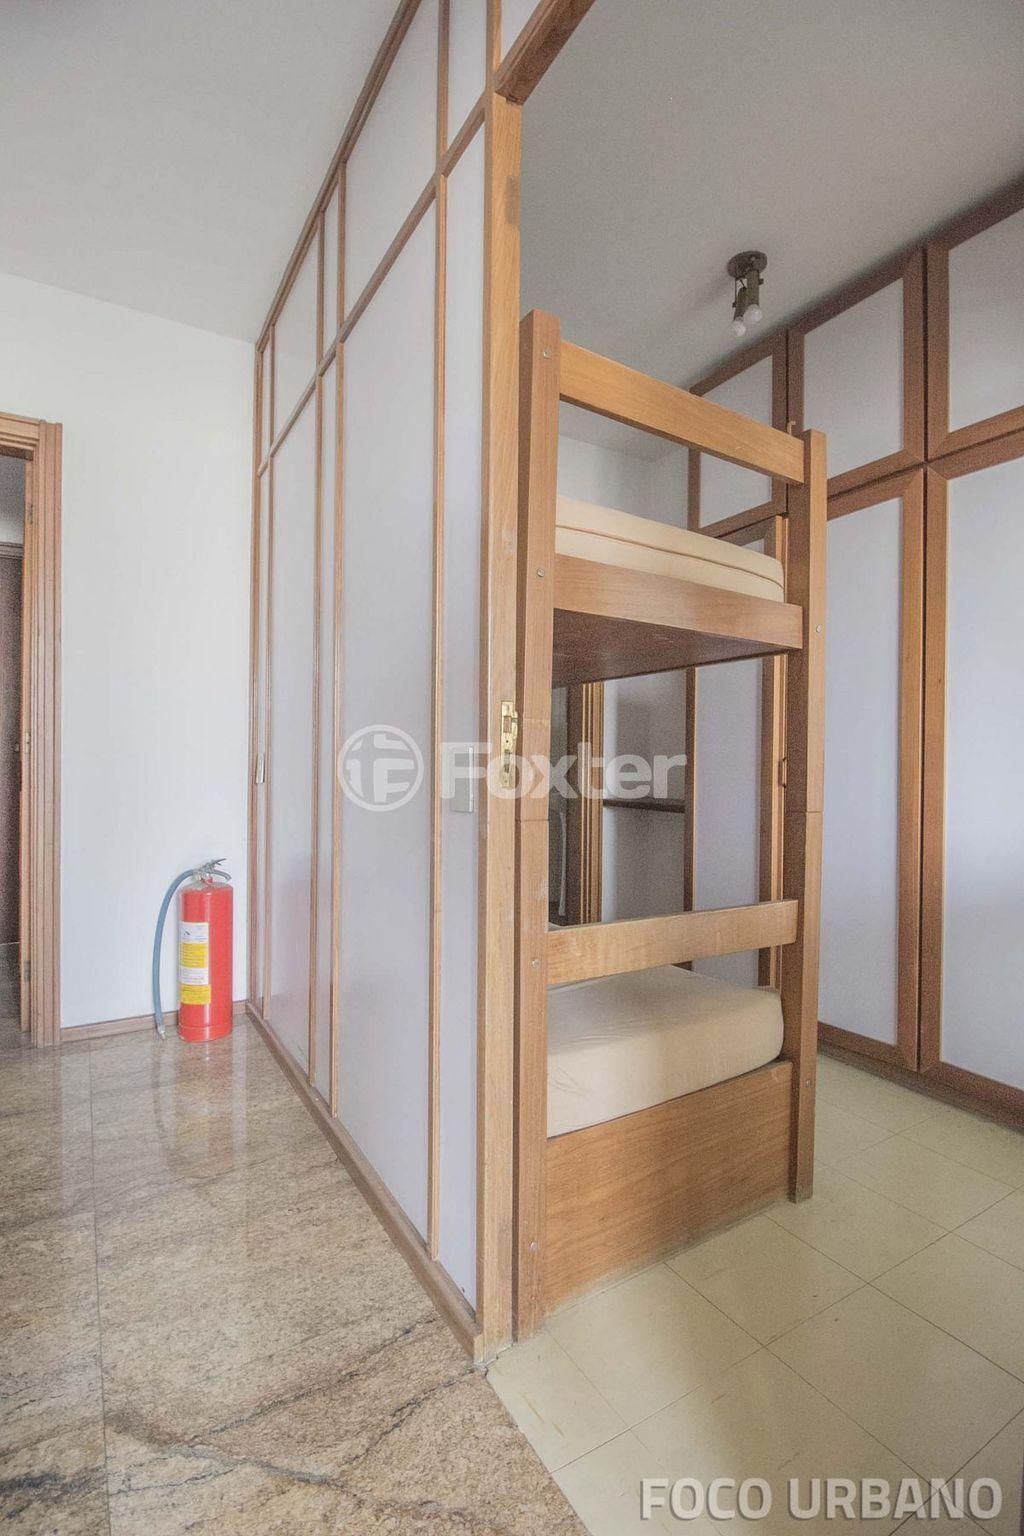 Cobertura 3 Dorm, Floresta, Porto Alegre (131891) - Foto 40